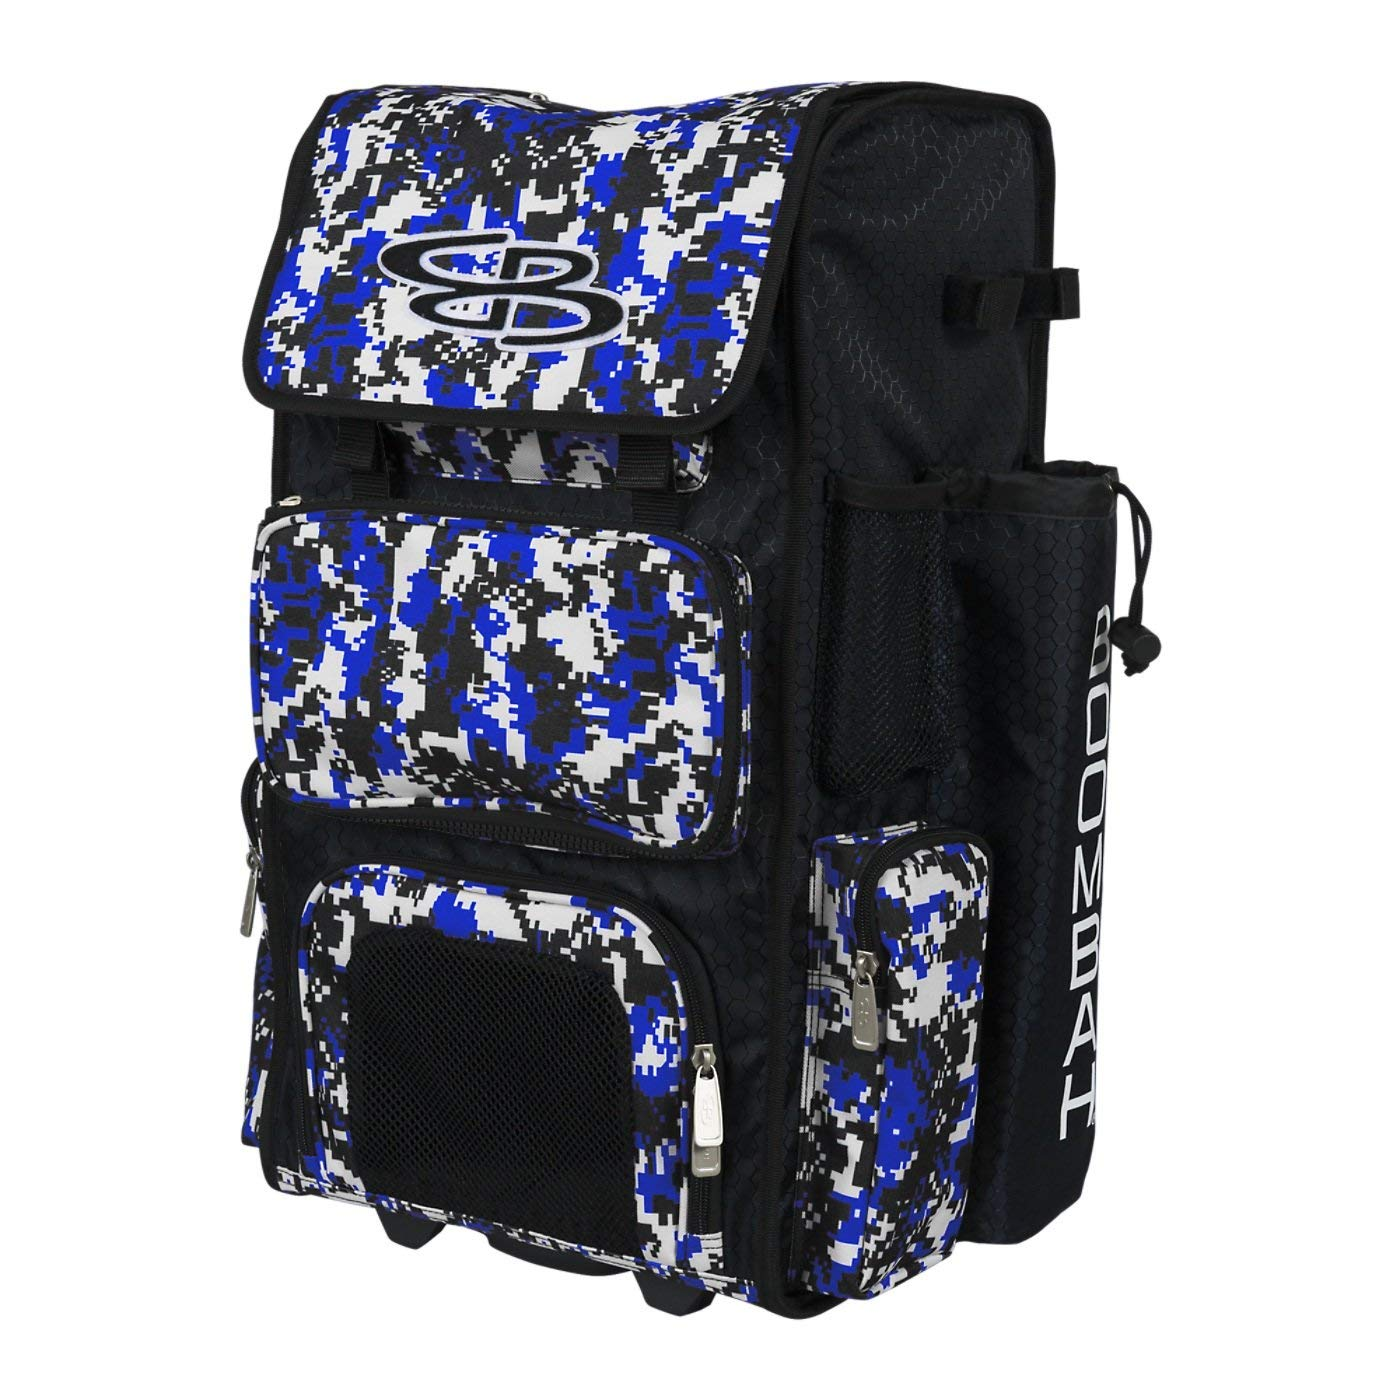 Holds 2 Bats Stealth Backpack Version no wheels Boombah Superpack Bat Pack